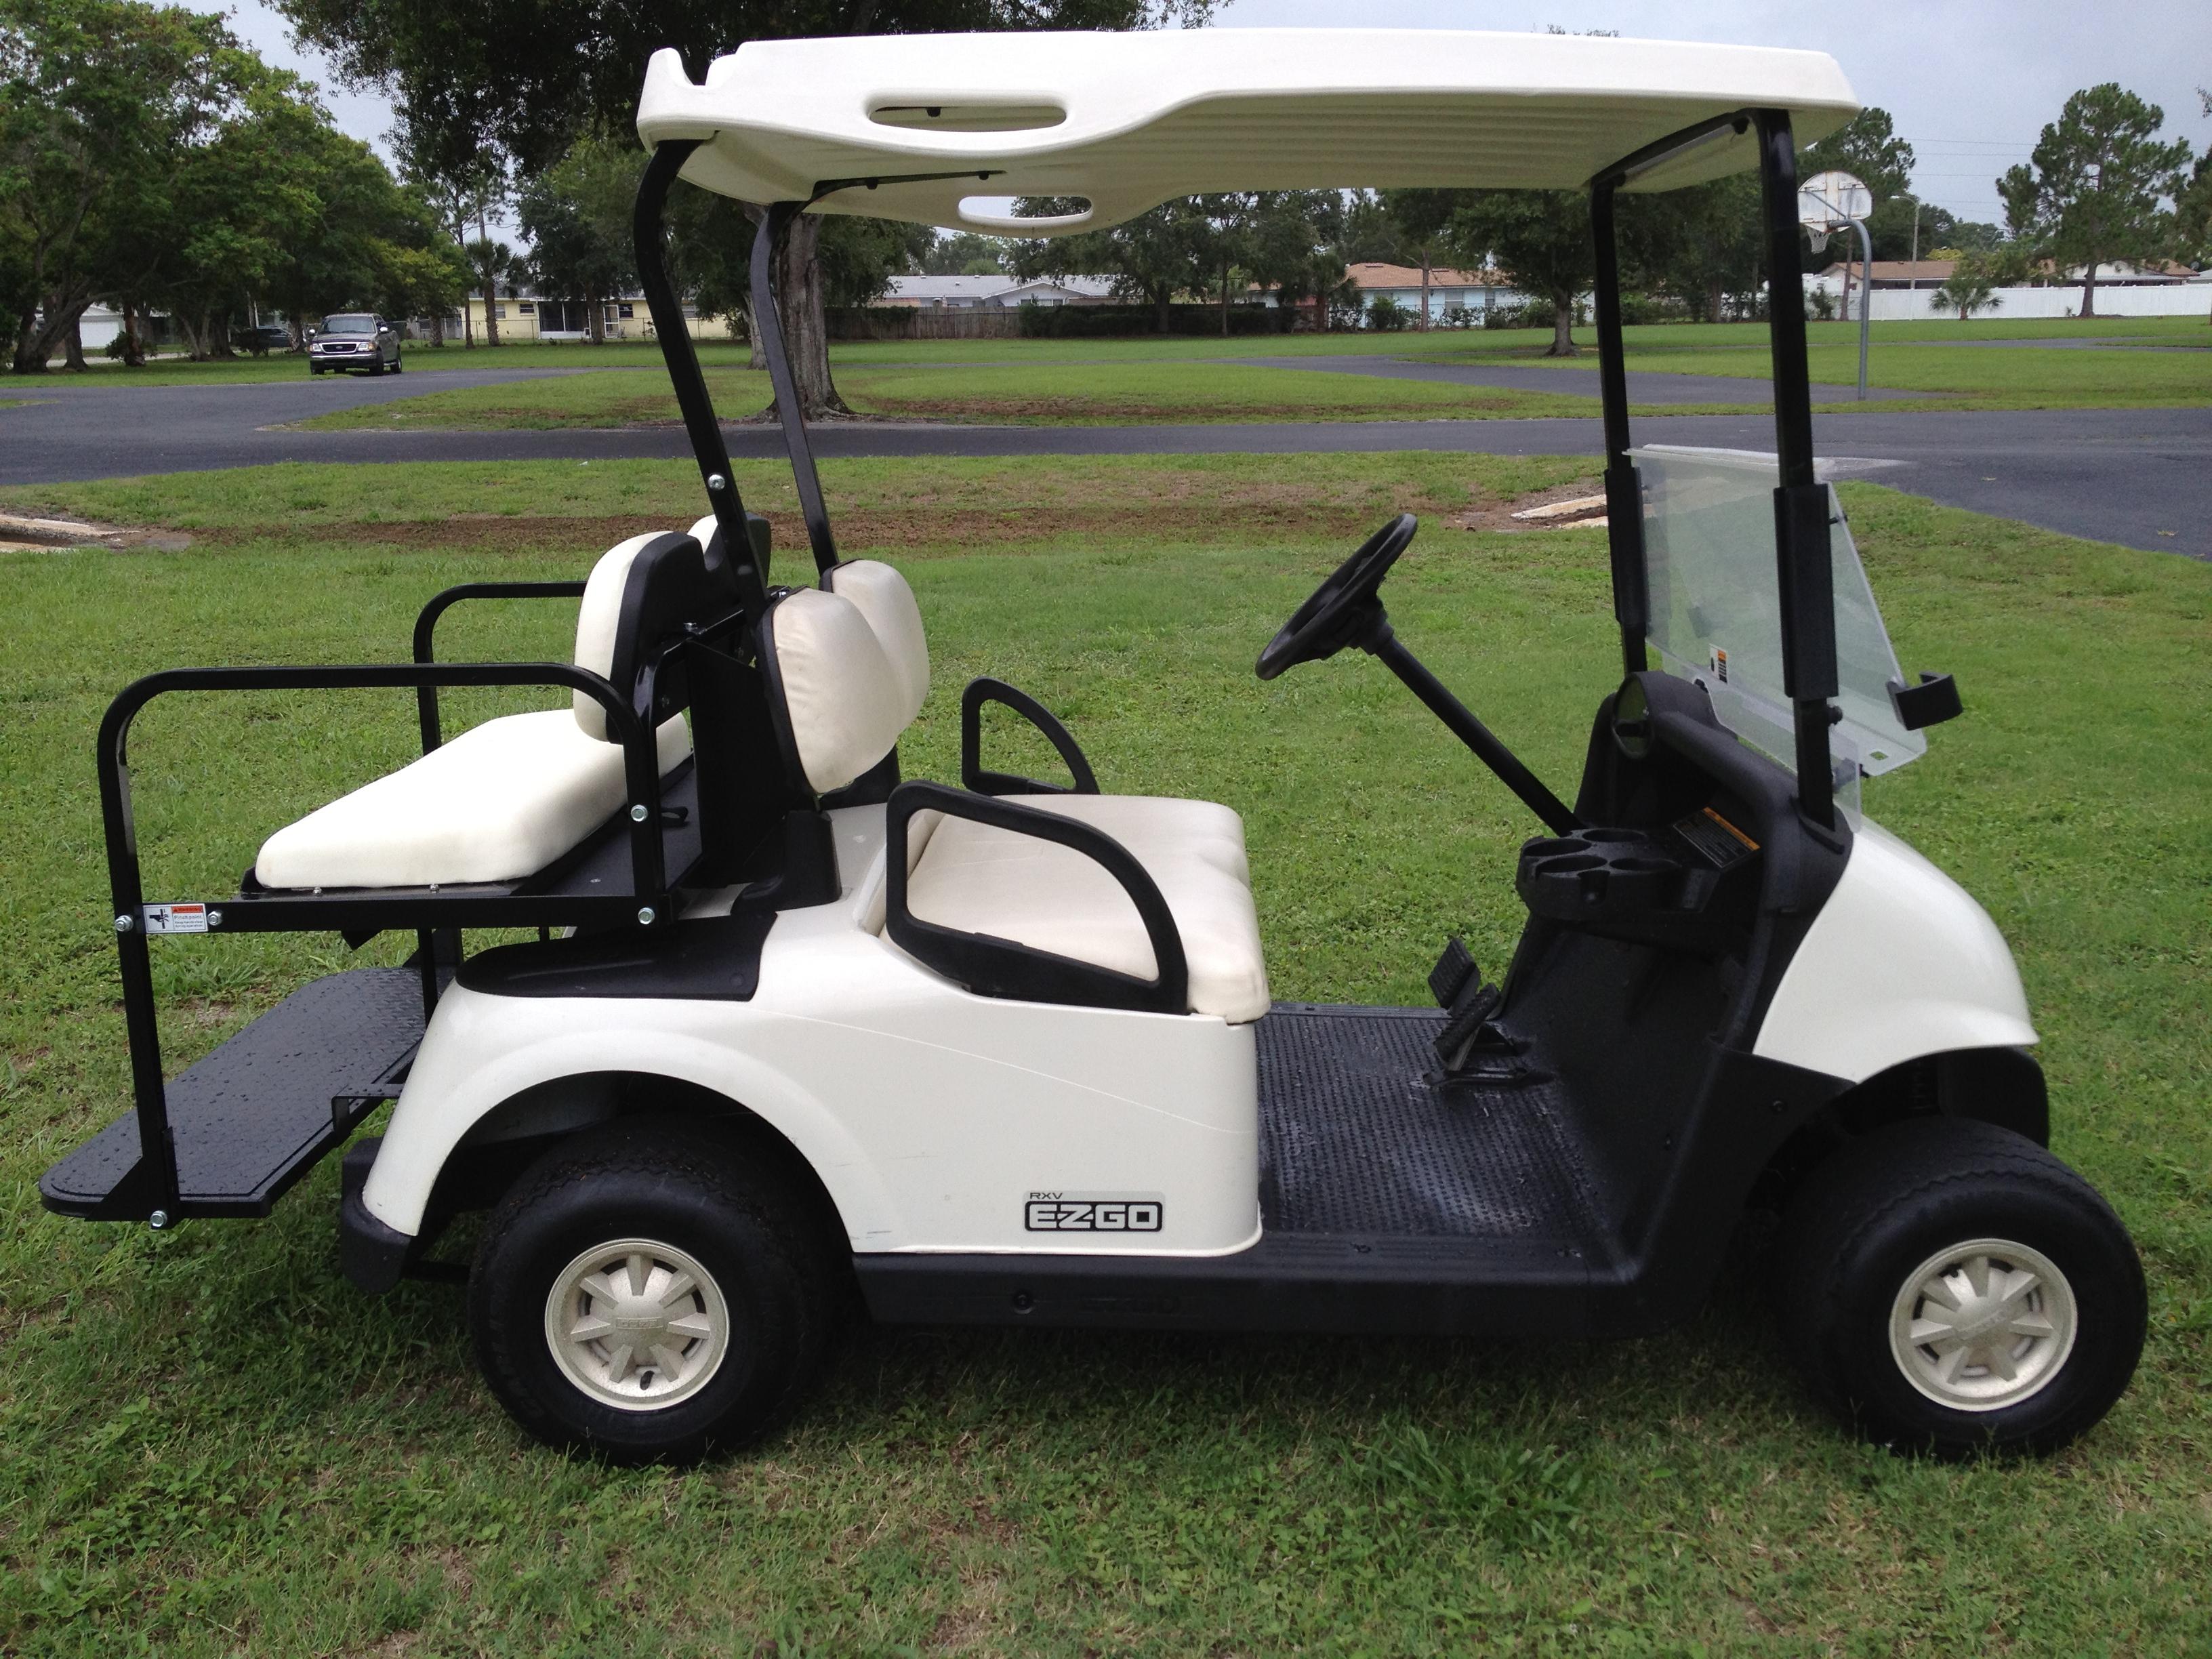 2009 EzGo RXV Golf Cart (4 Seat) · Tiger's Discount Store · Online Golf Cart Discount on discount tool carts, discount shoes, cheap book carts, discount golf mats,